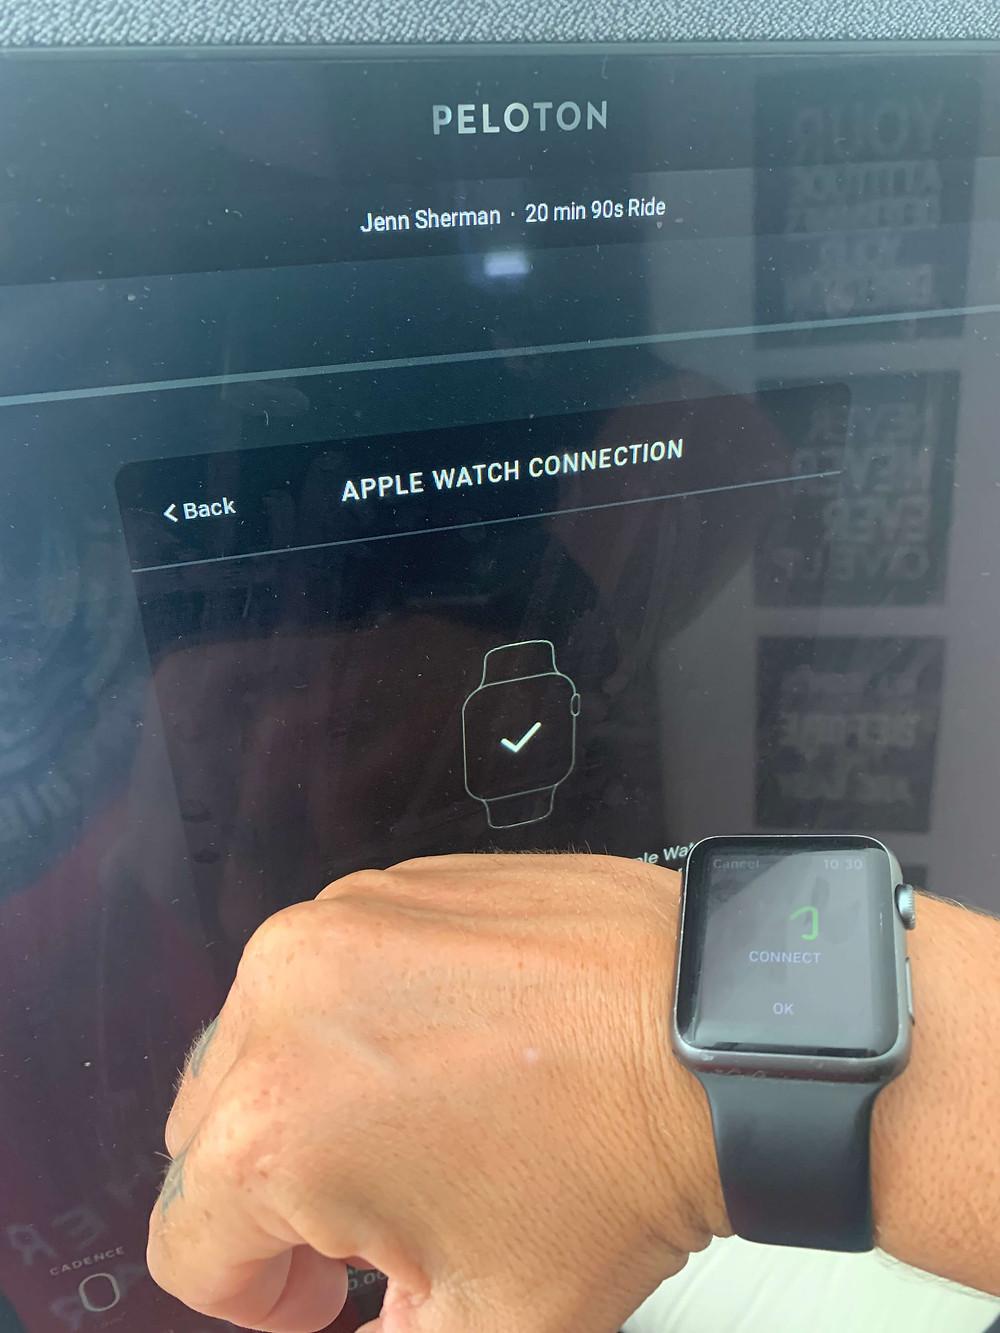 peloton-bike-plus-apple-watch-pairing